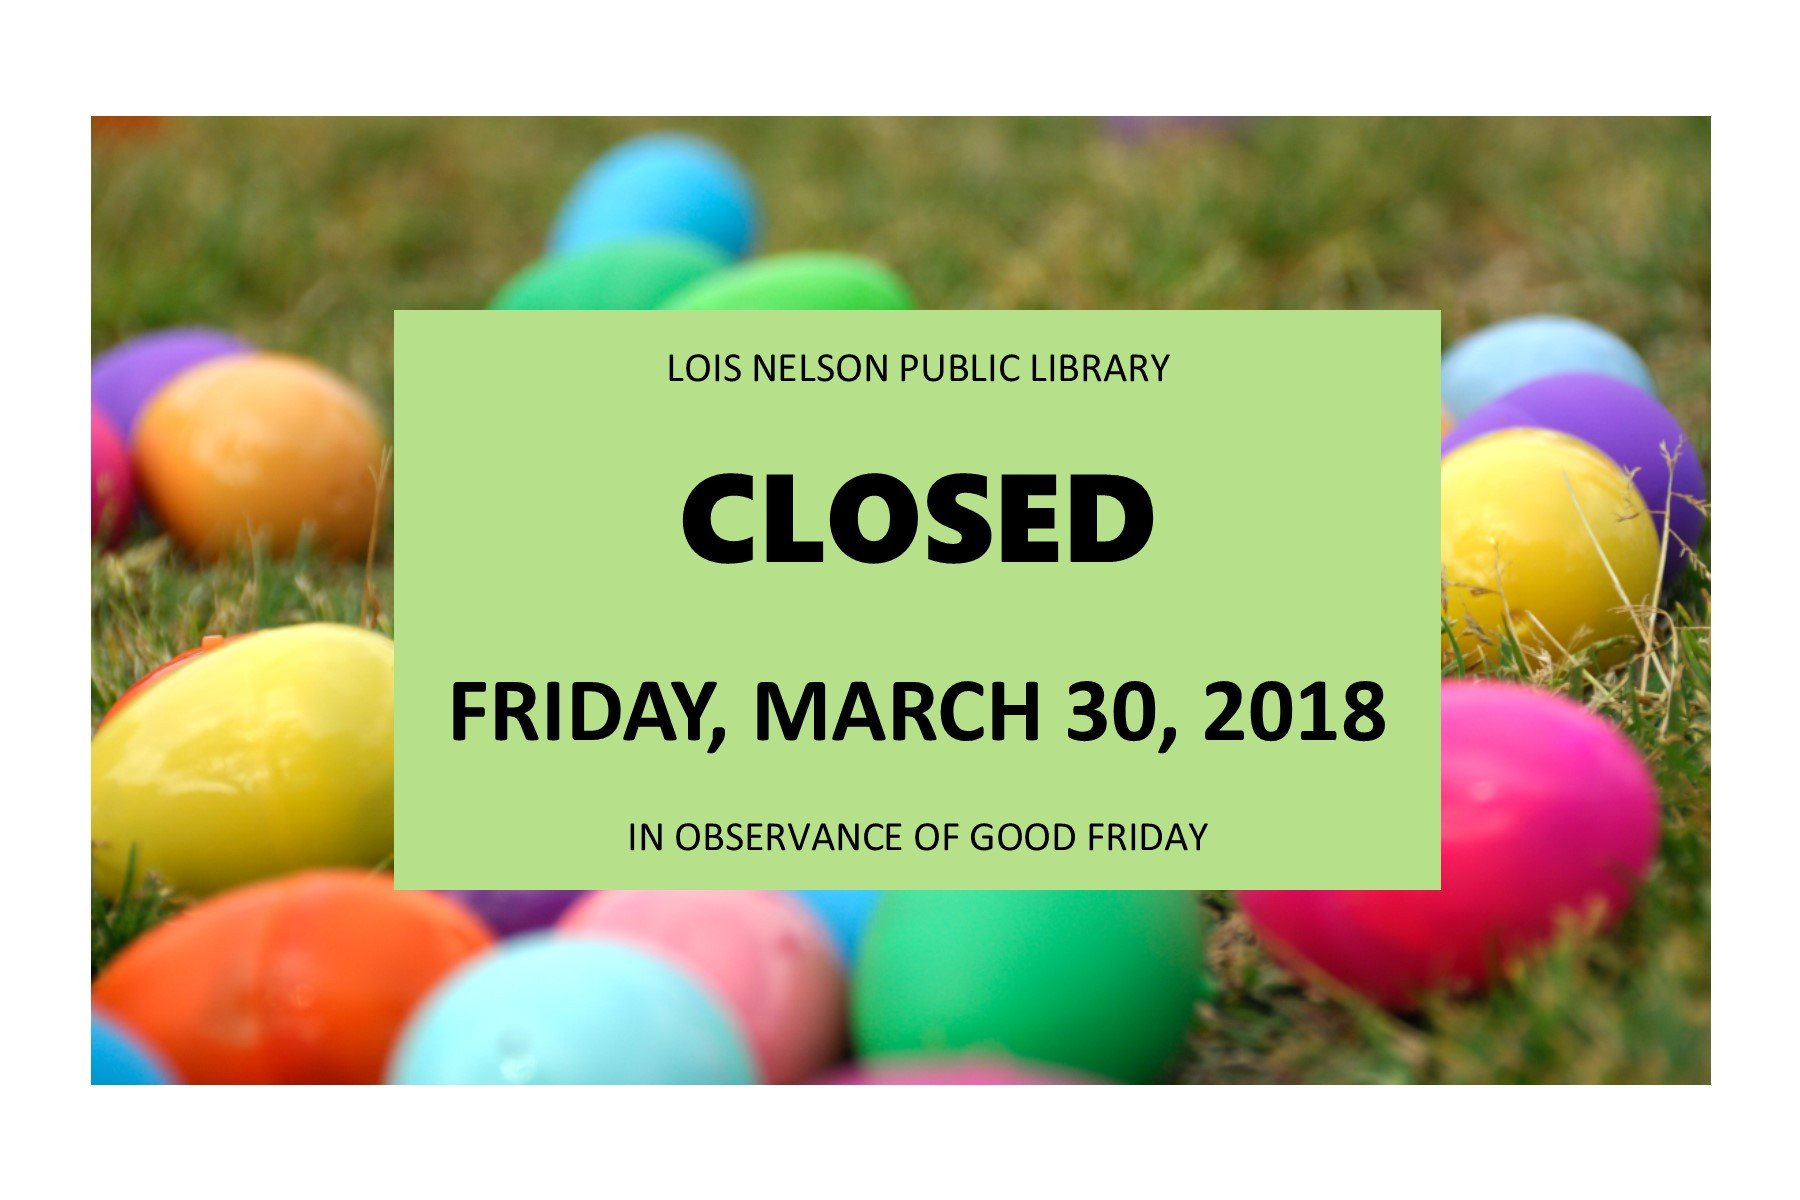 Closed Good Friday Sign Library Closed Good Friday